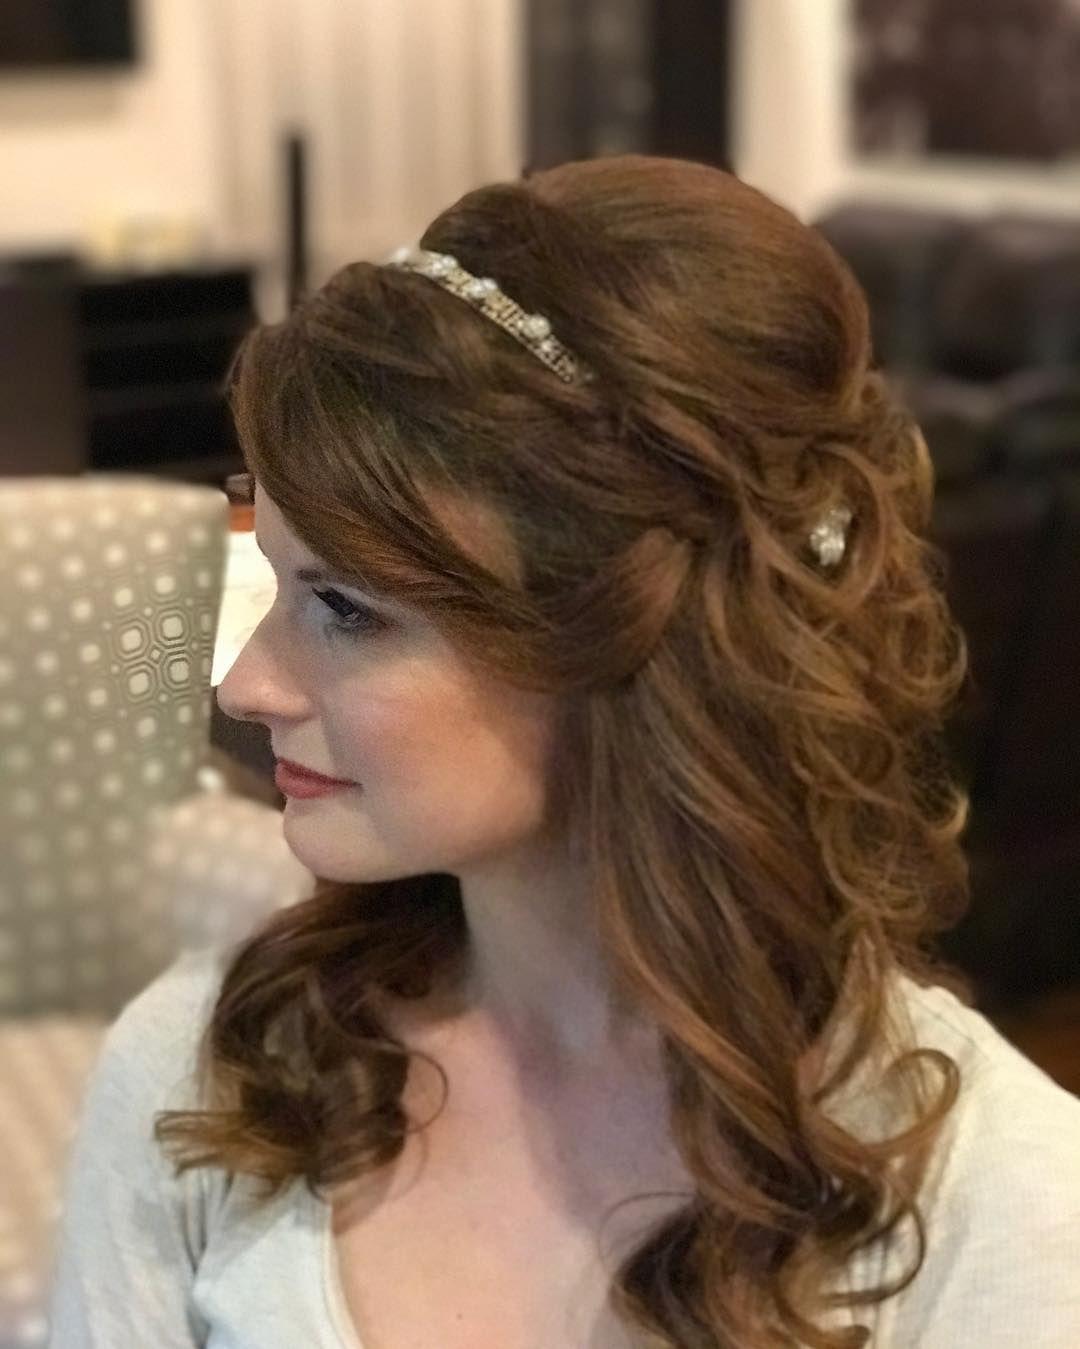 Salon Maison Amazing Bridal Curls Bride hairstyles